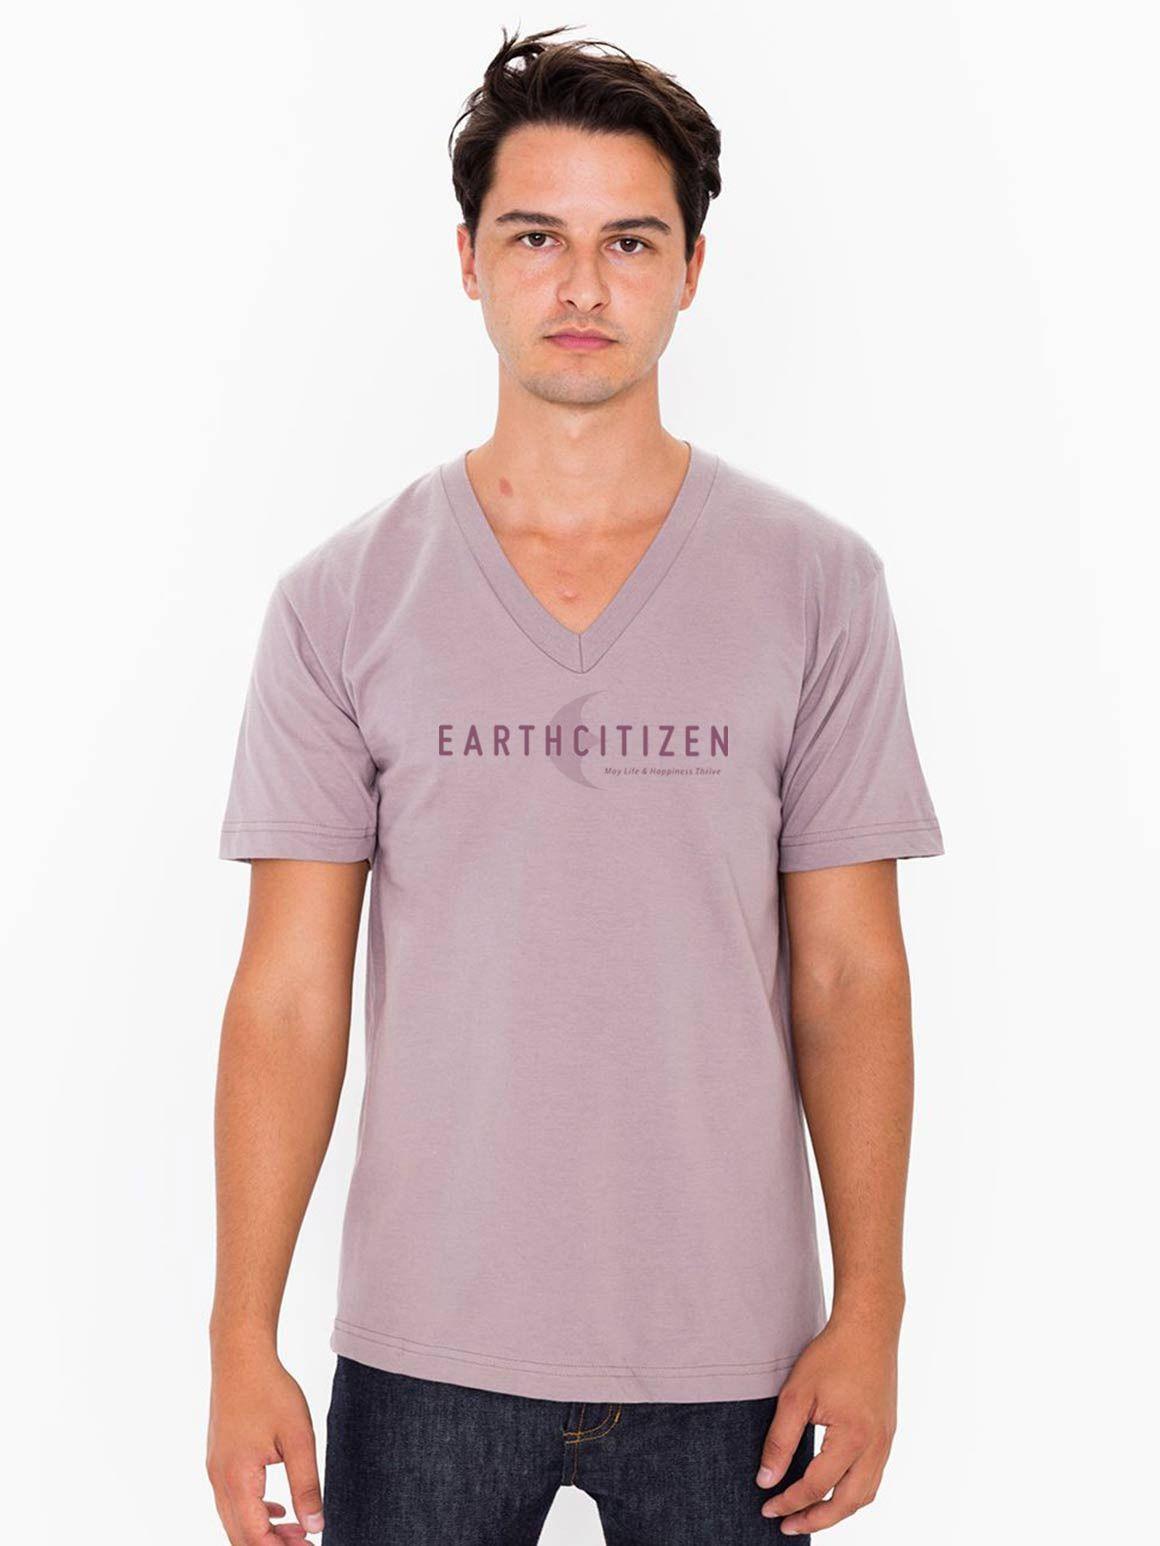 EC V1 Logo - #Vision - Organic Cotton V Neck T-Shirt - Adults'